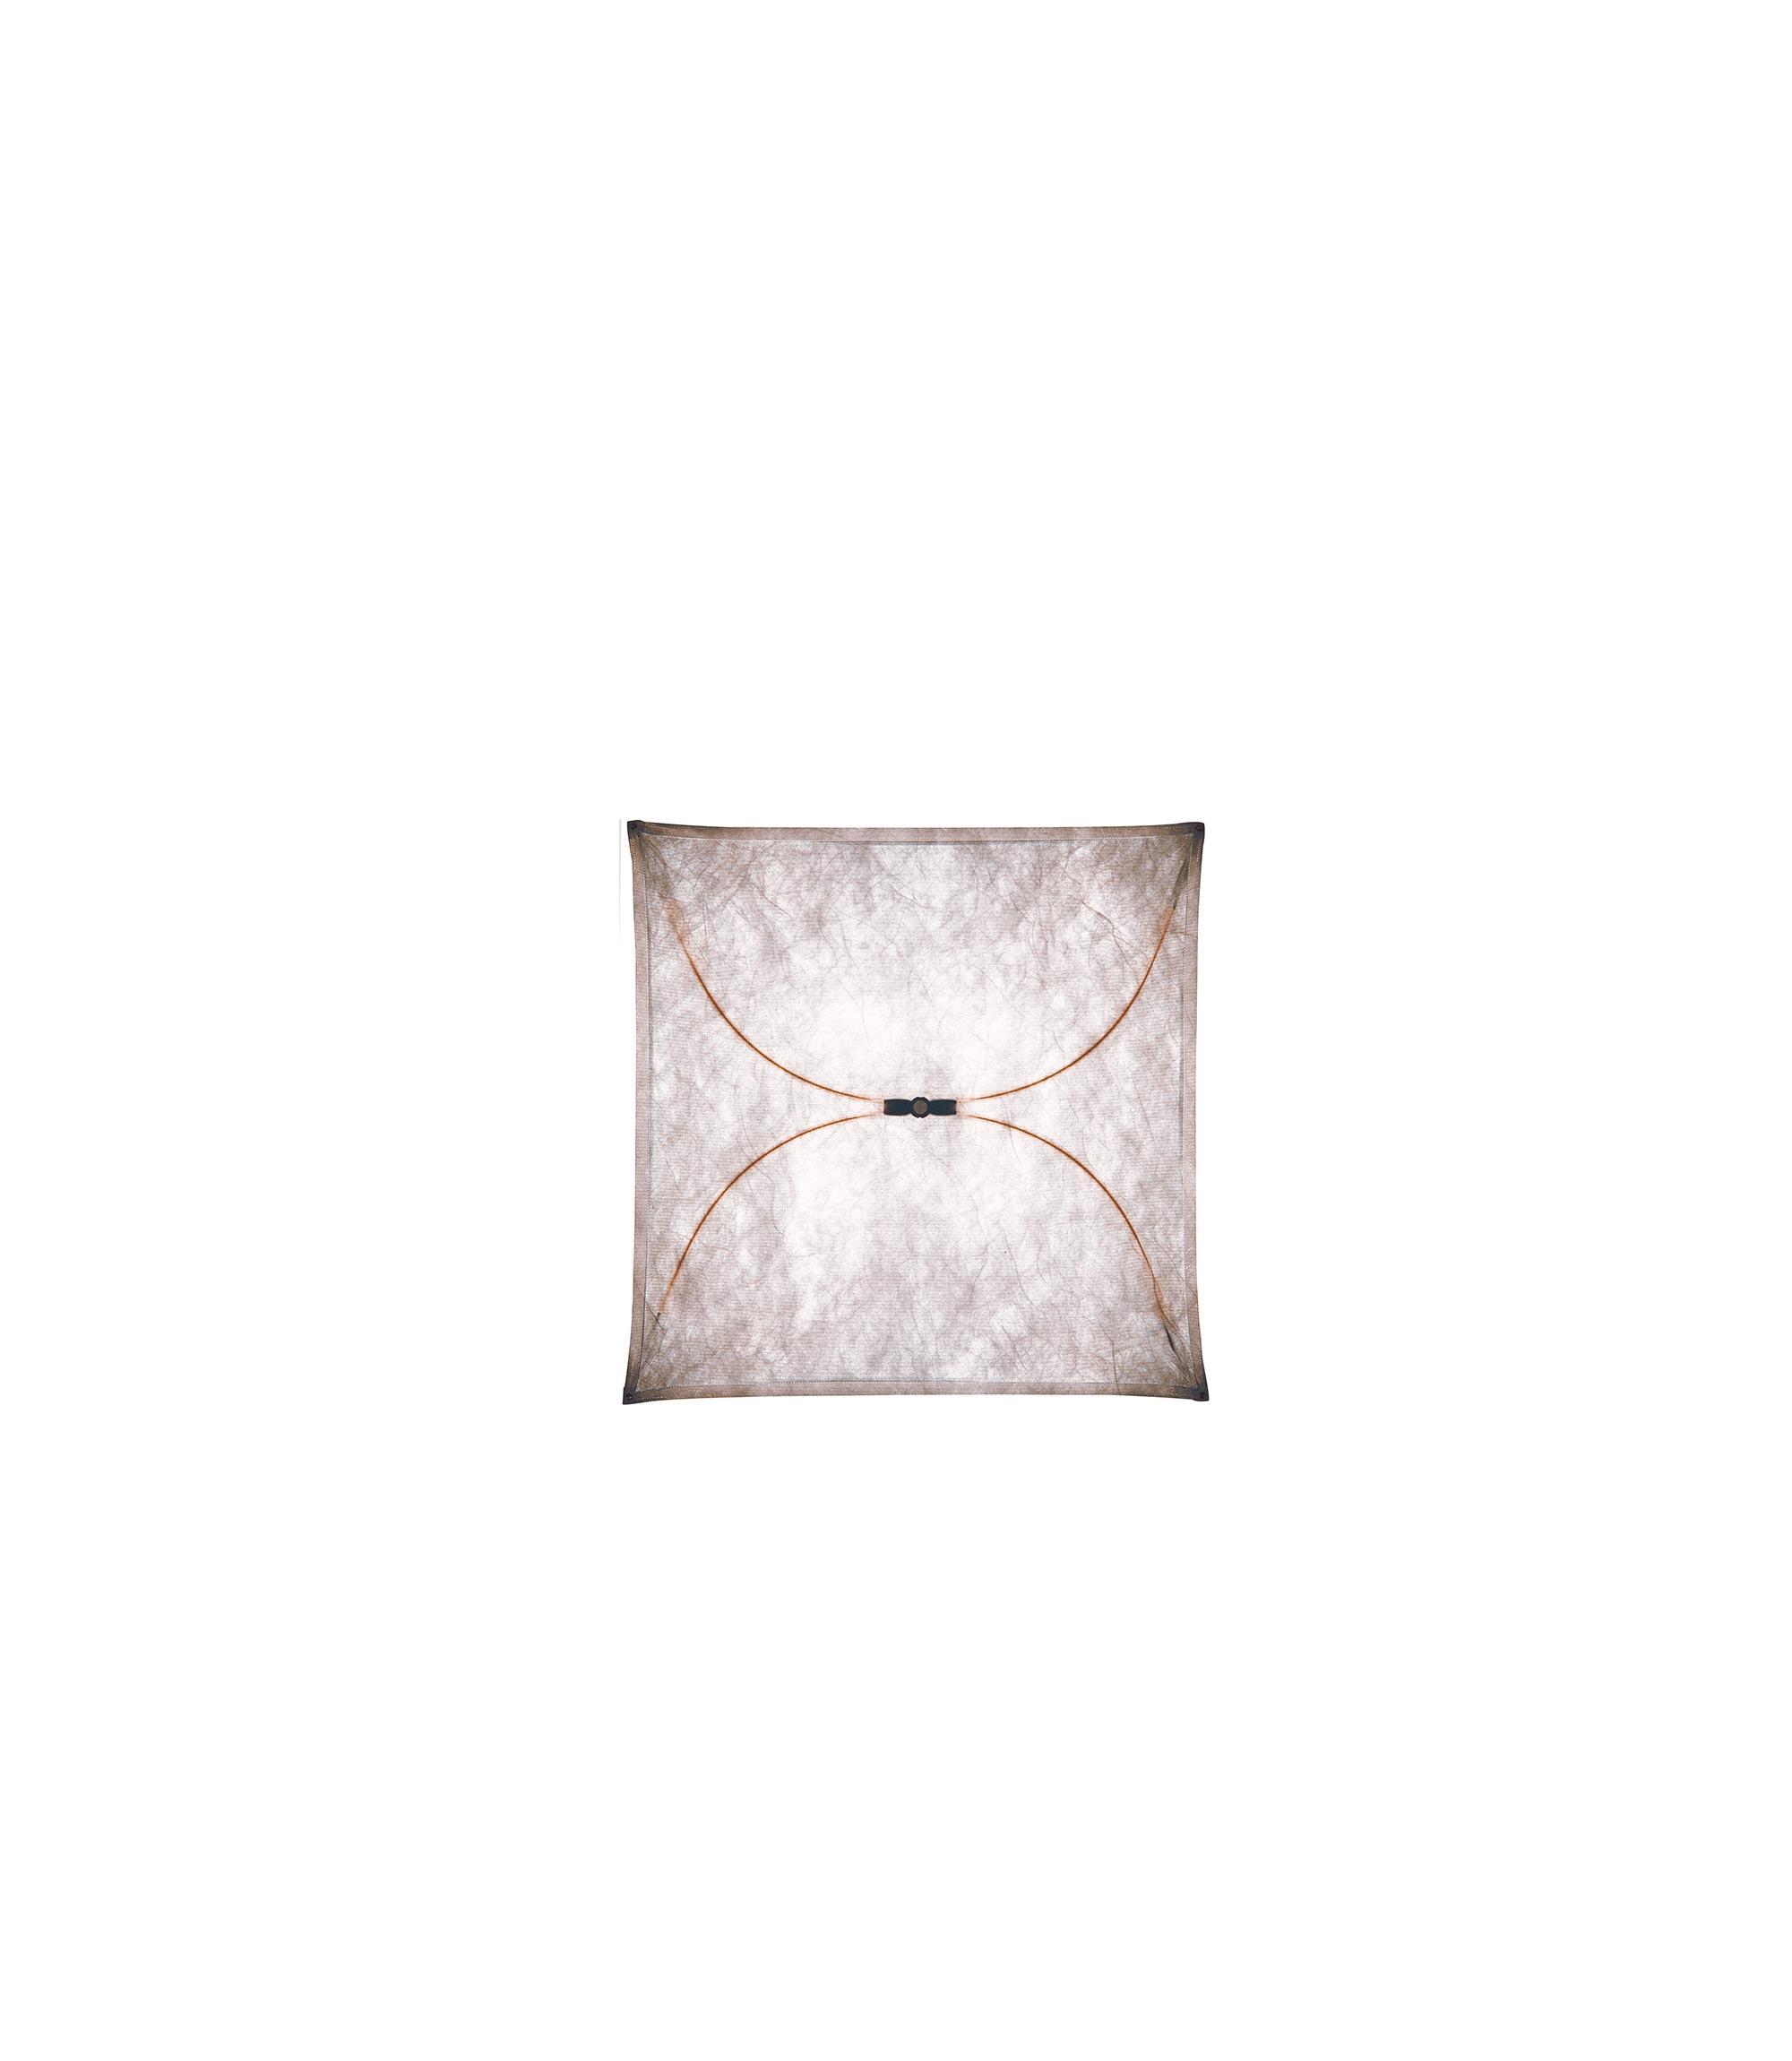 Ariette 2 ceiling wall scarpa flos F05000 product still life big 1